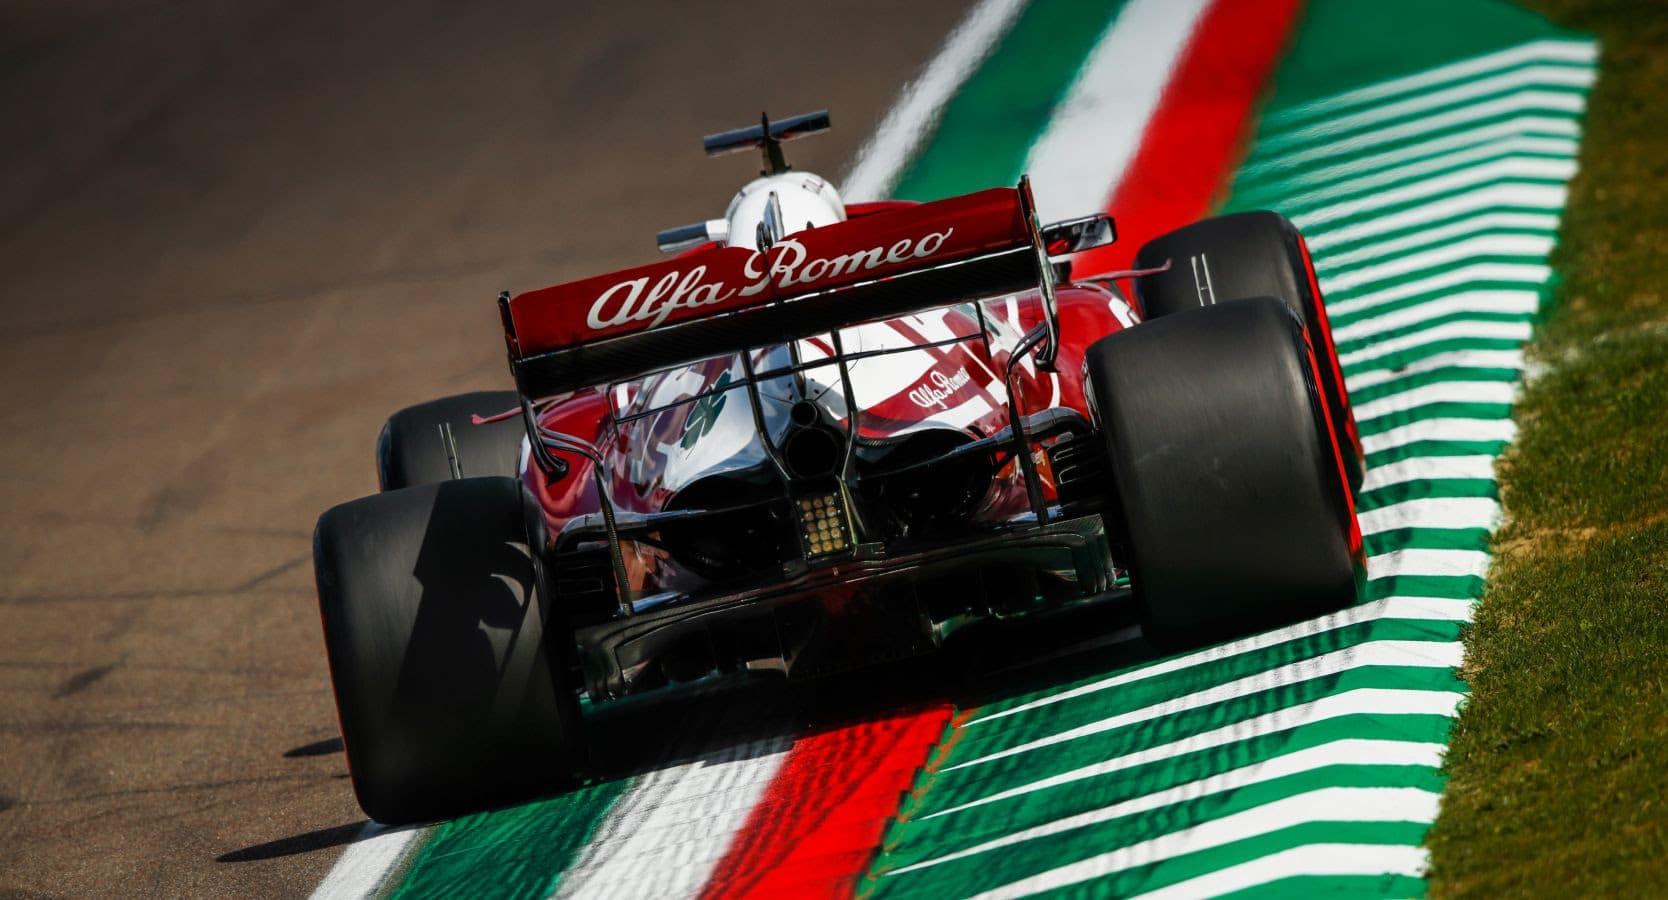 unnamed Alfa Romeo & Sauber Motorsport : Επεκτείνουν τη συνεργασία τους, με μακροπρόθεσμο ορίζοντα alfa romeo, Alfa romeo racing, Formula 1, Sauber Motorsport, ειδήσεις, Νέα